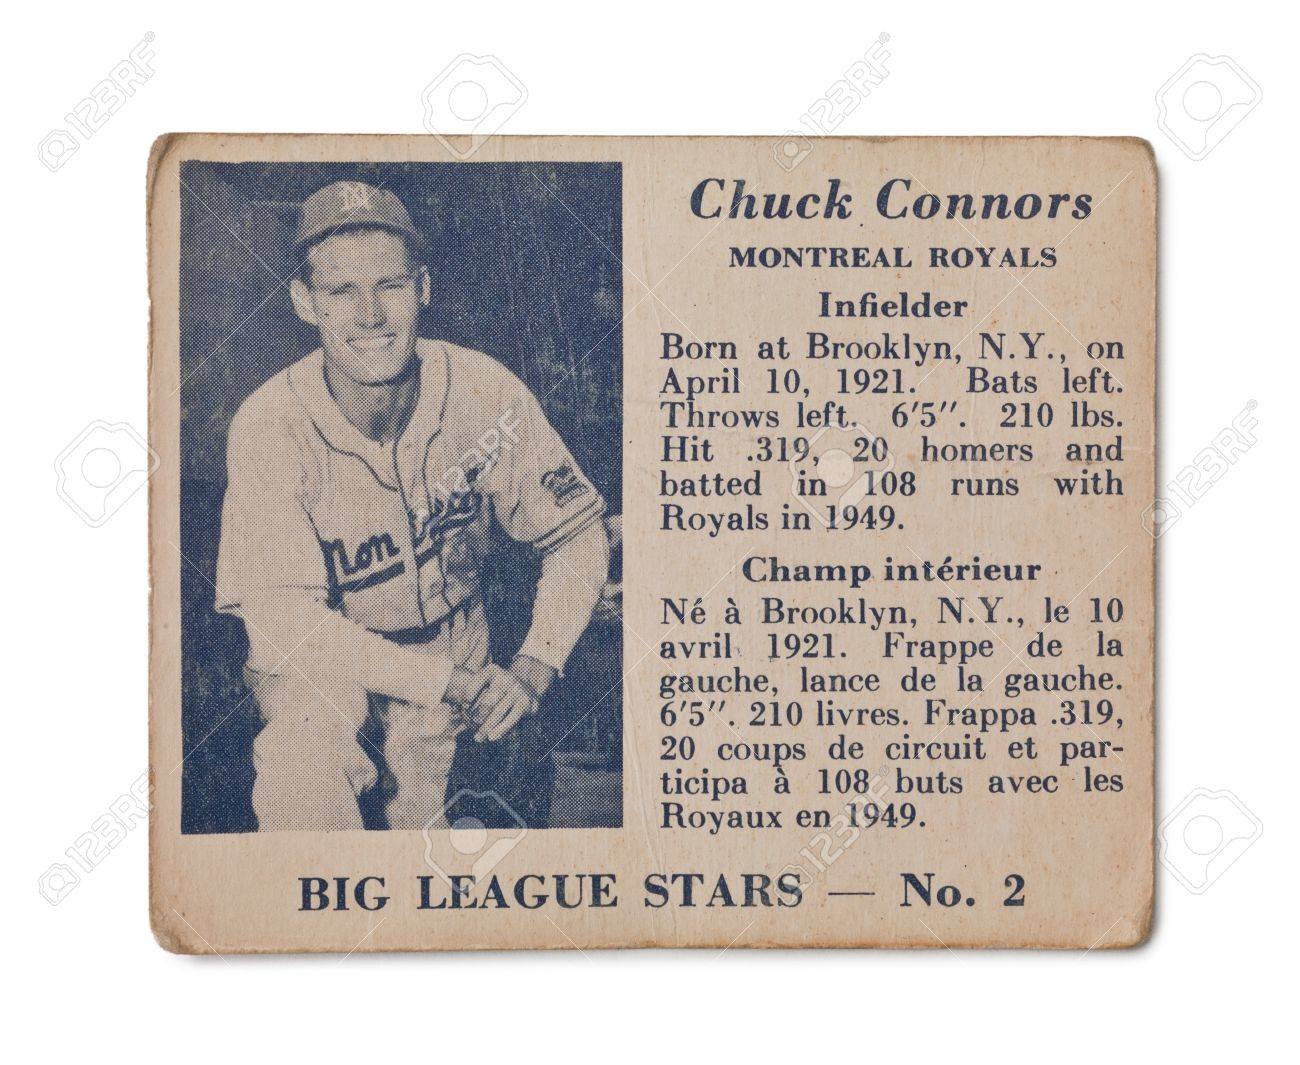 Vintage Chuck Connors Baseball Card Montreal Royals Infielder